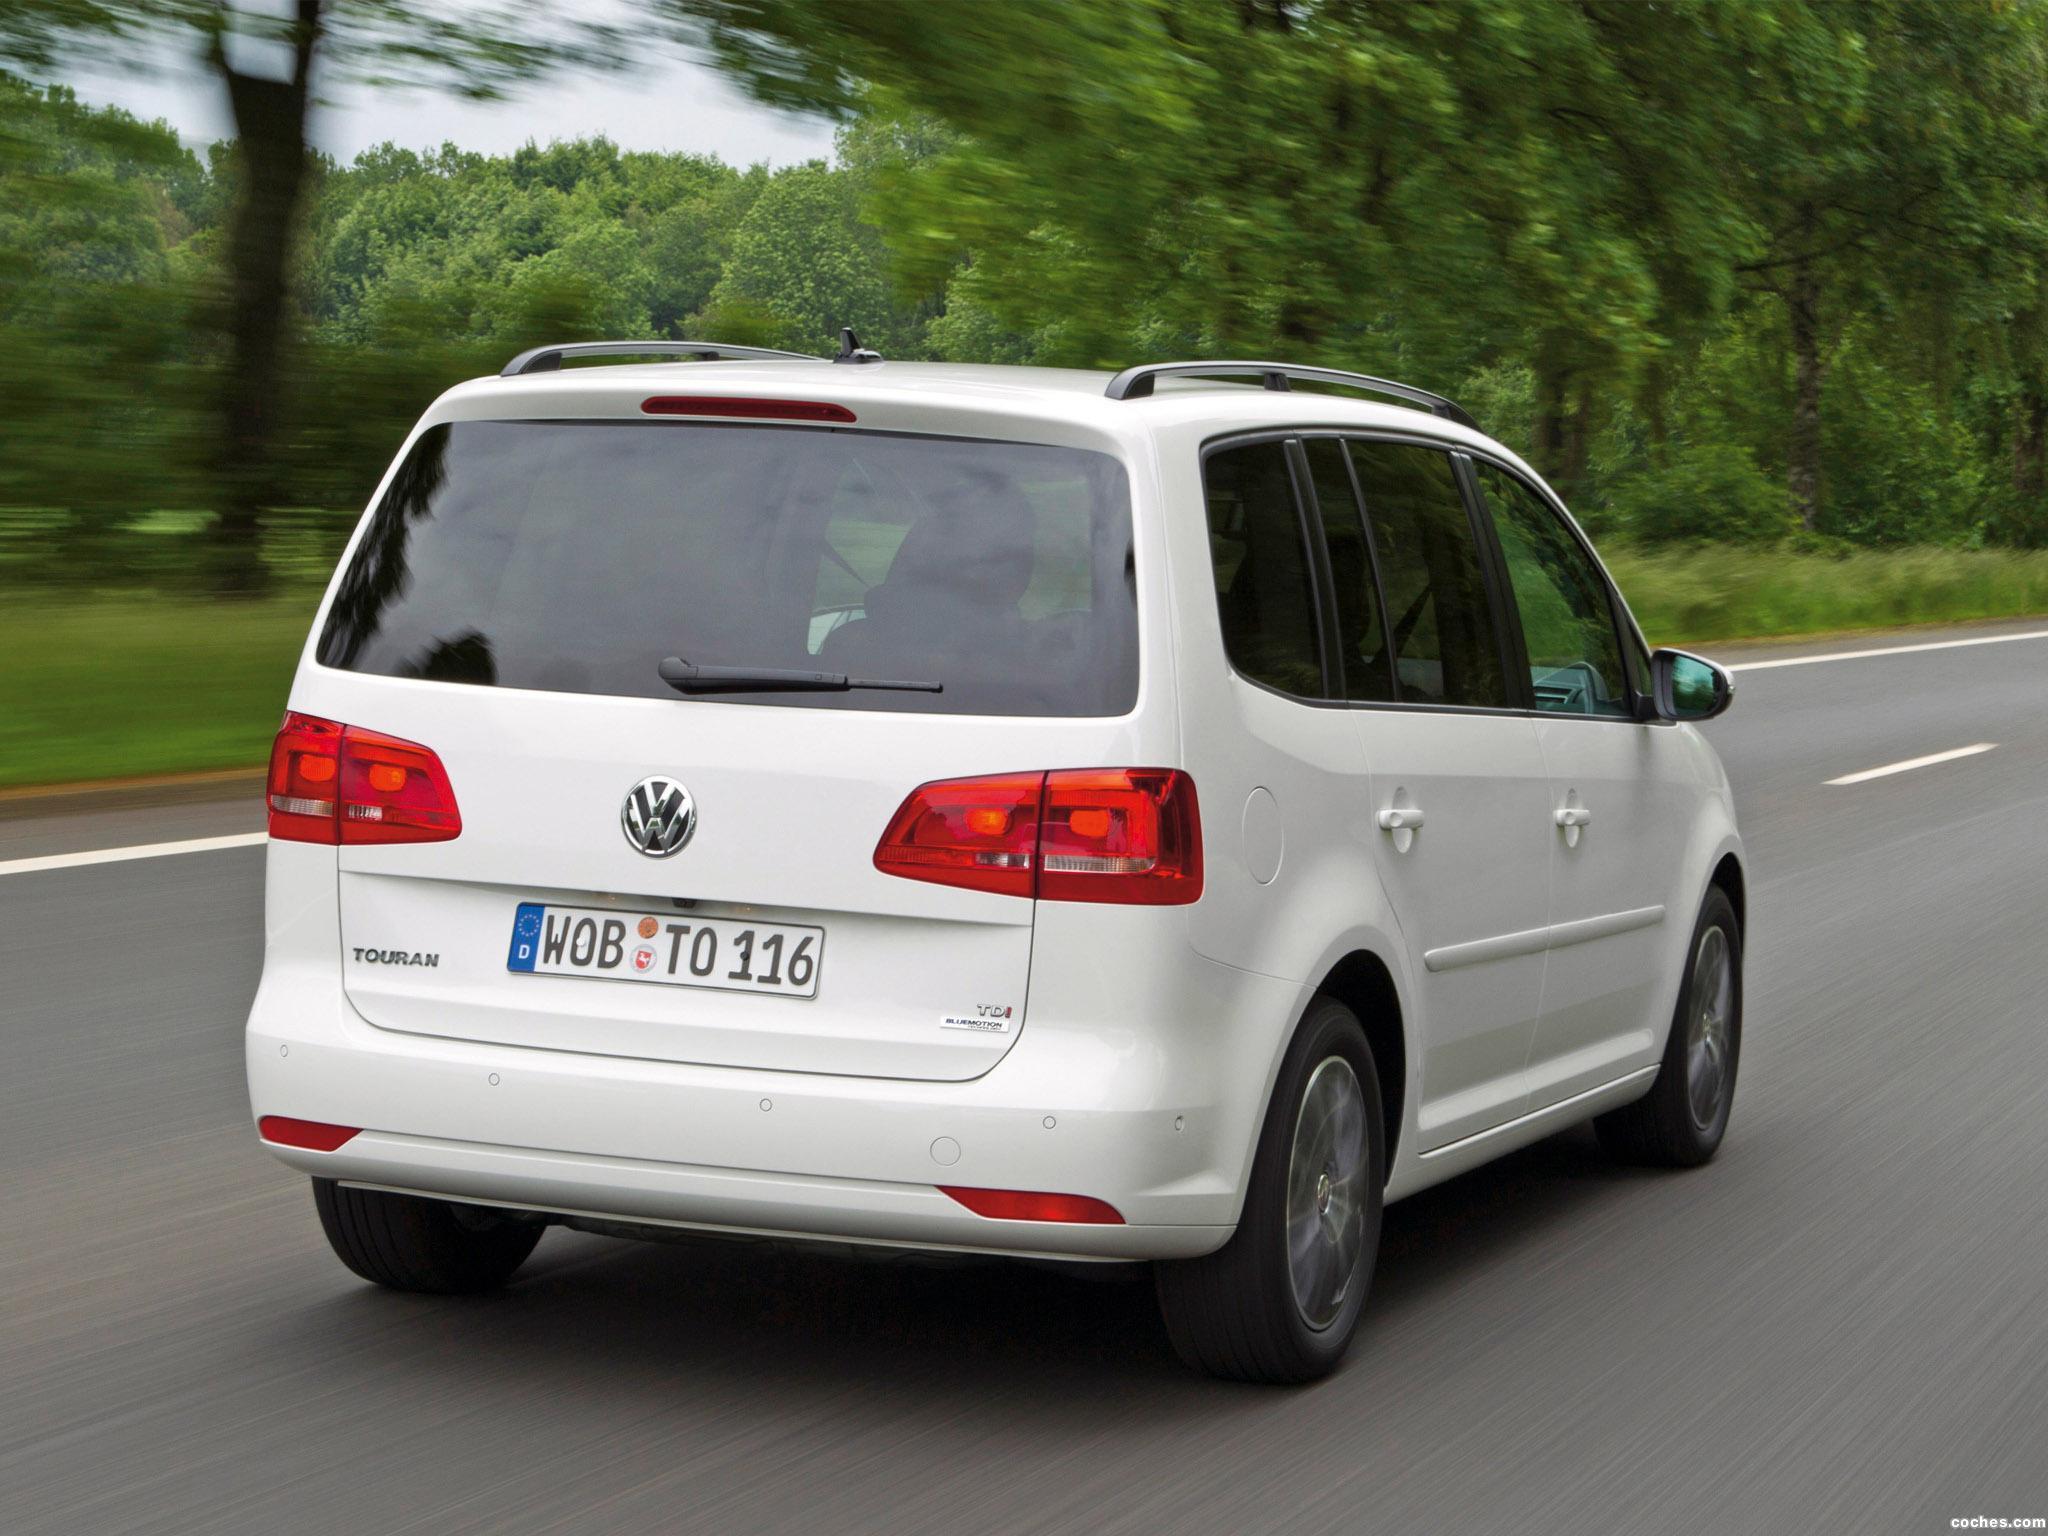 Foto 2 de Volkswagen Touran BlueMotion 2010